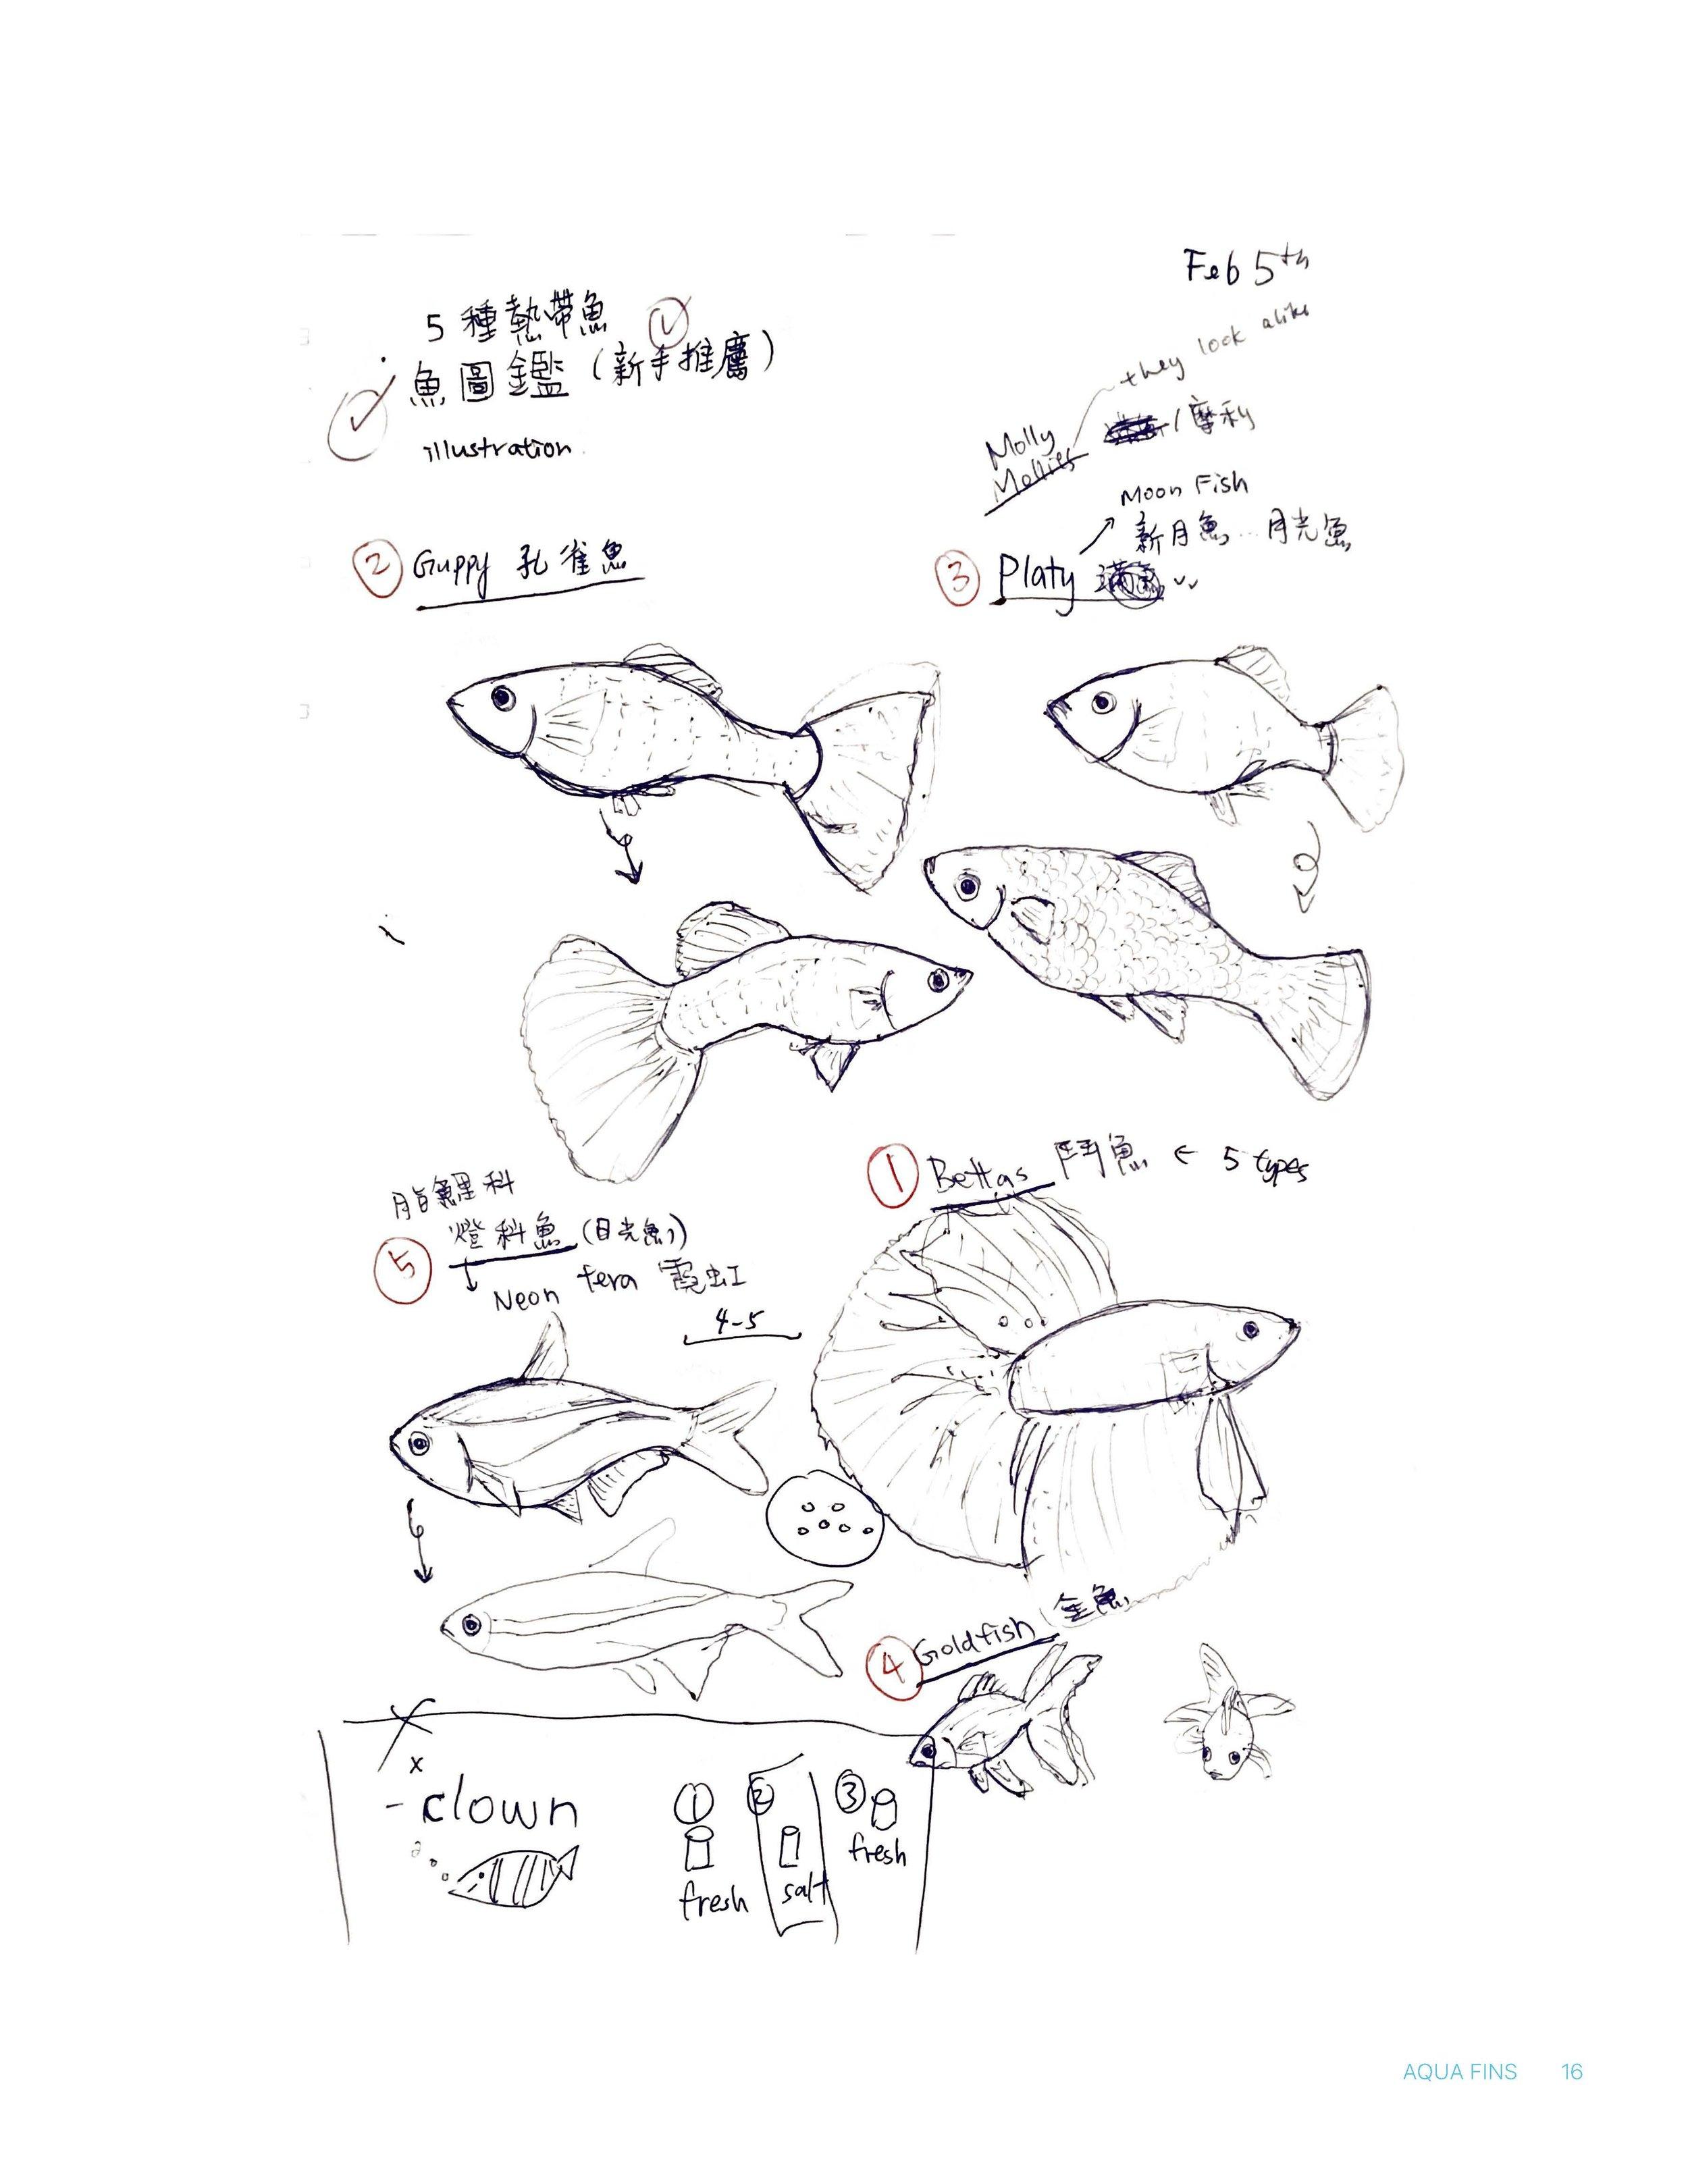 4010_Project 2_Fish_process_2_Page_16.jpg